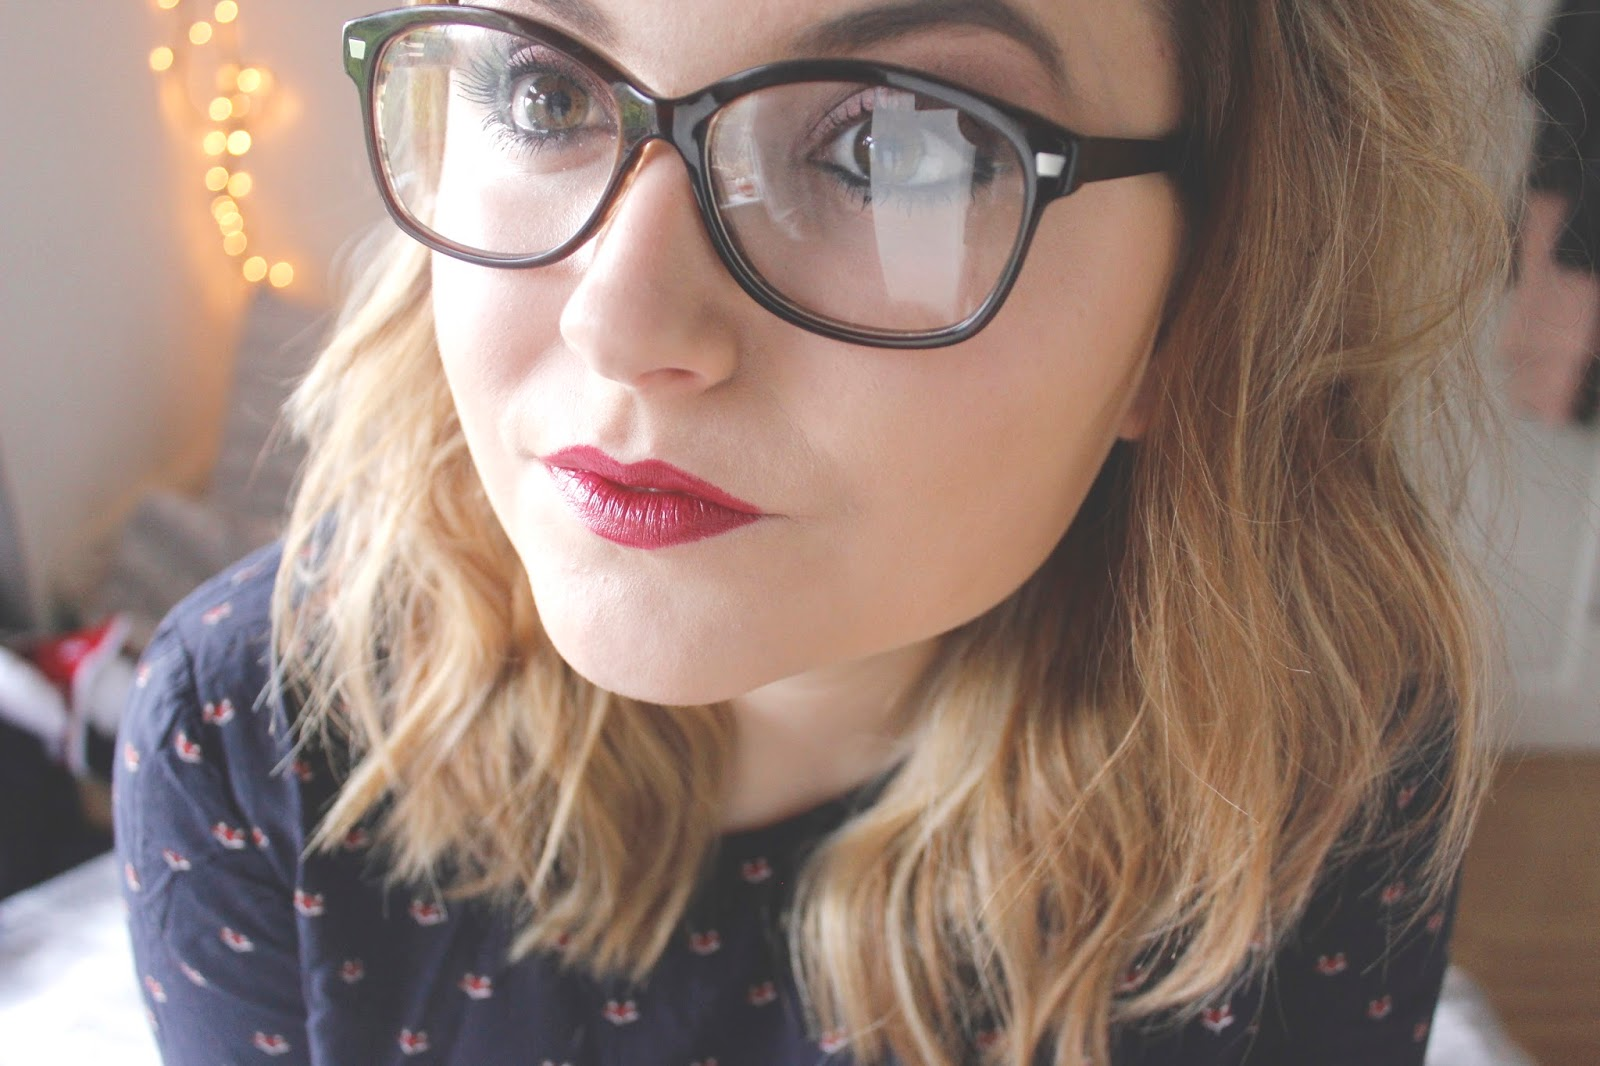 See The Stars - Make for glasses